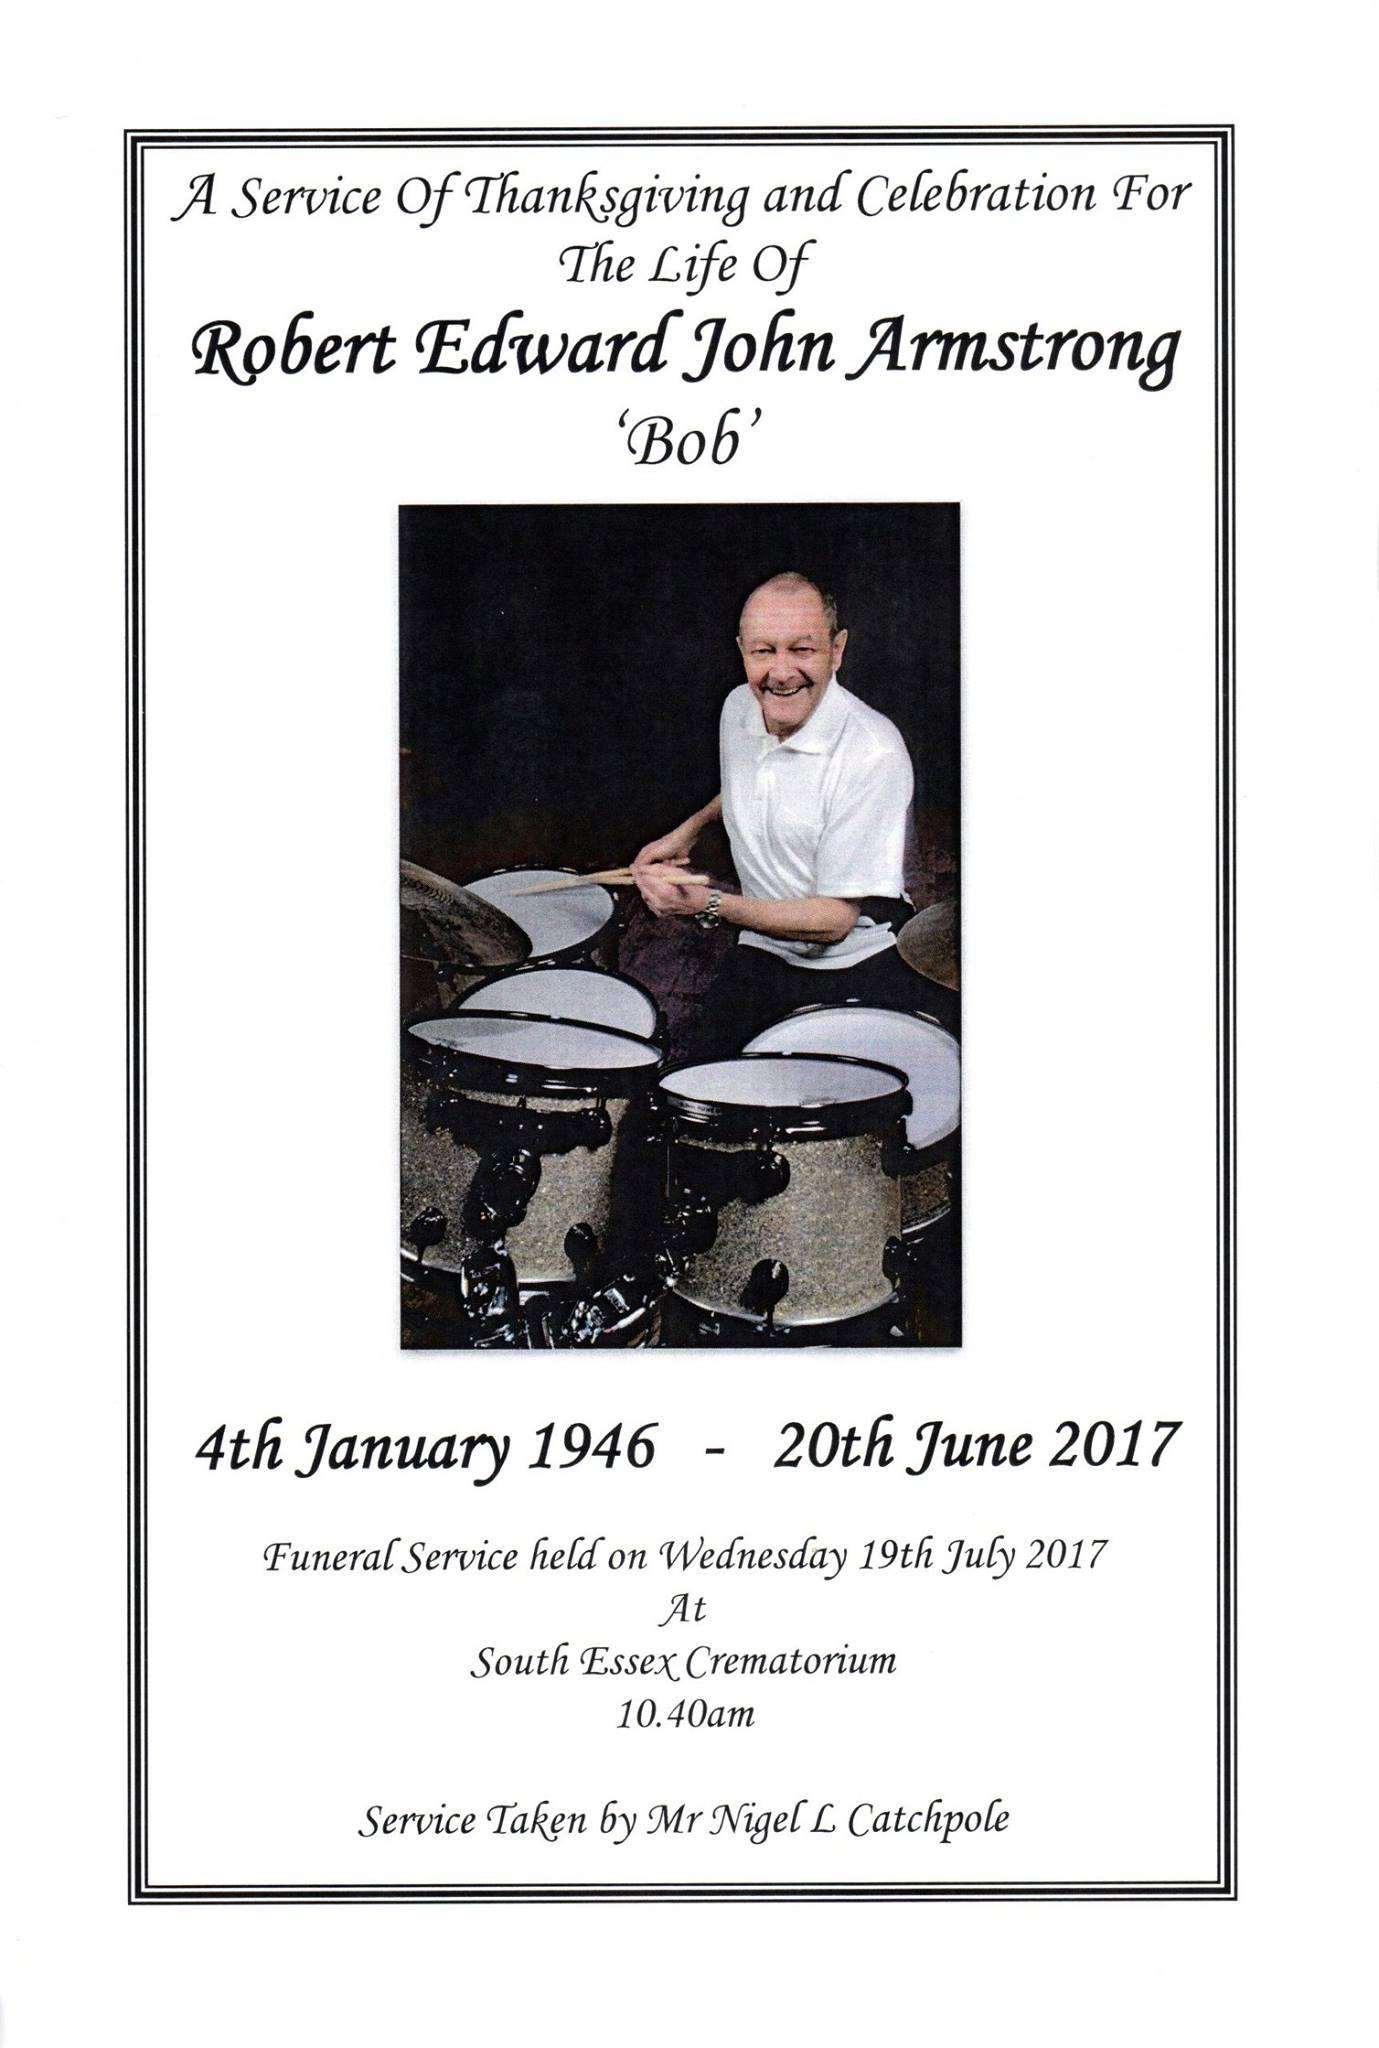 Bob Armstrong Funeral Order of Service © Darren Ashford 2017